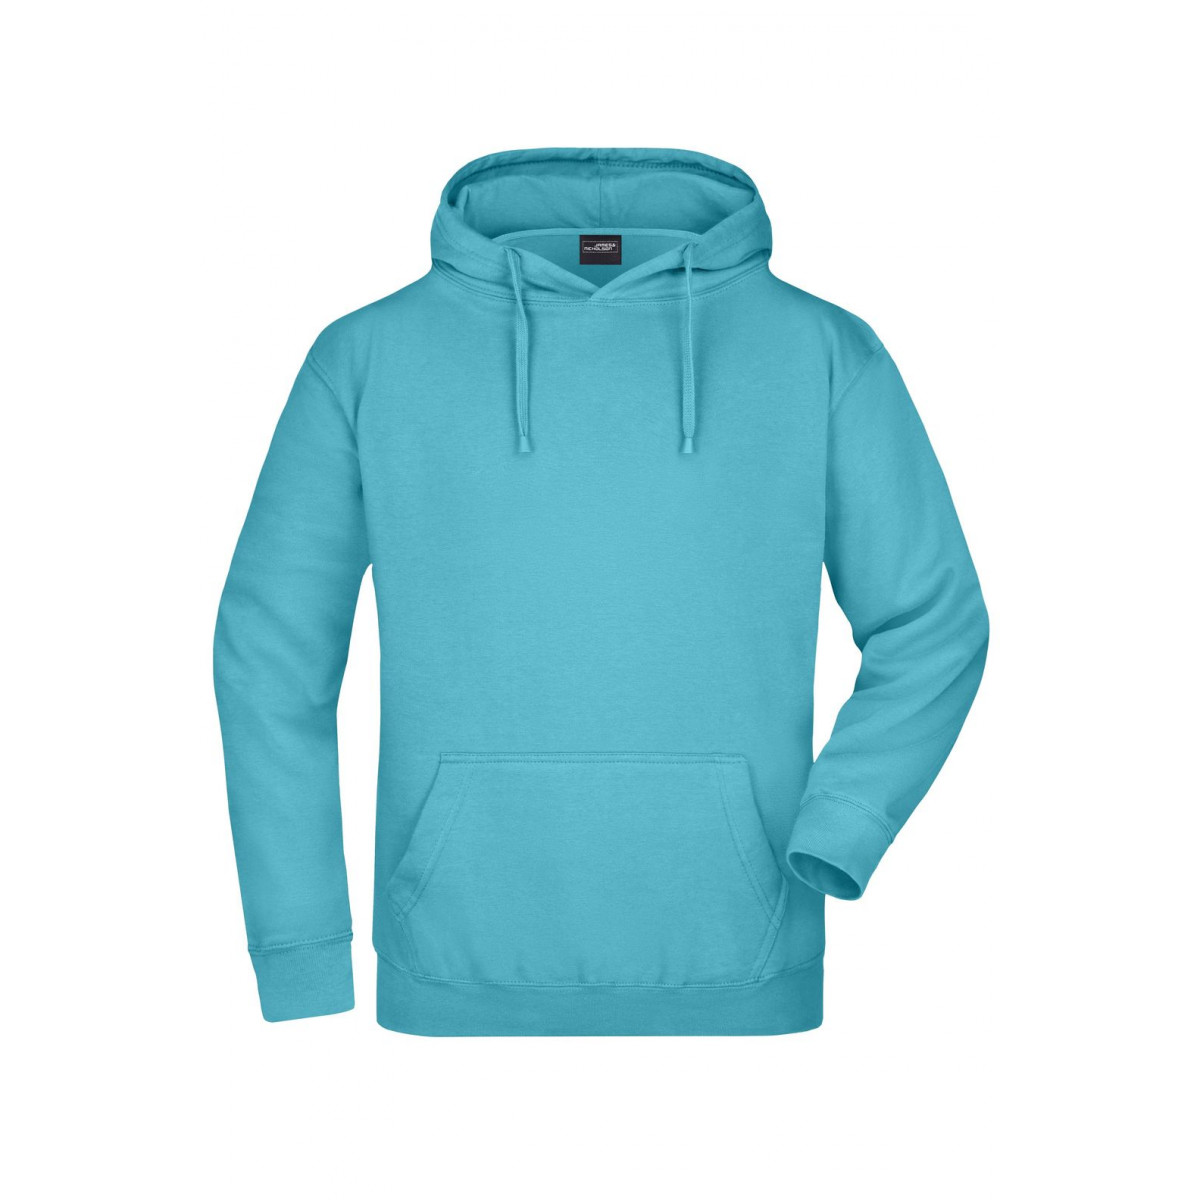 Толстовка мужская JN047 Hooded Sweat - Пасифик